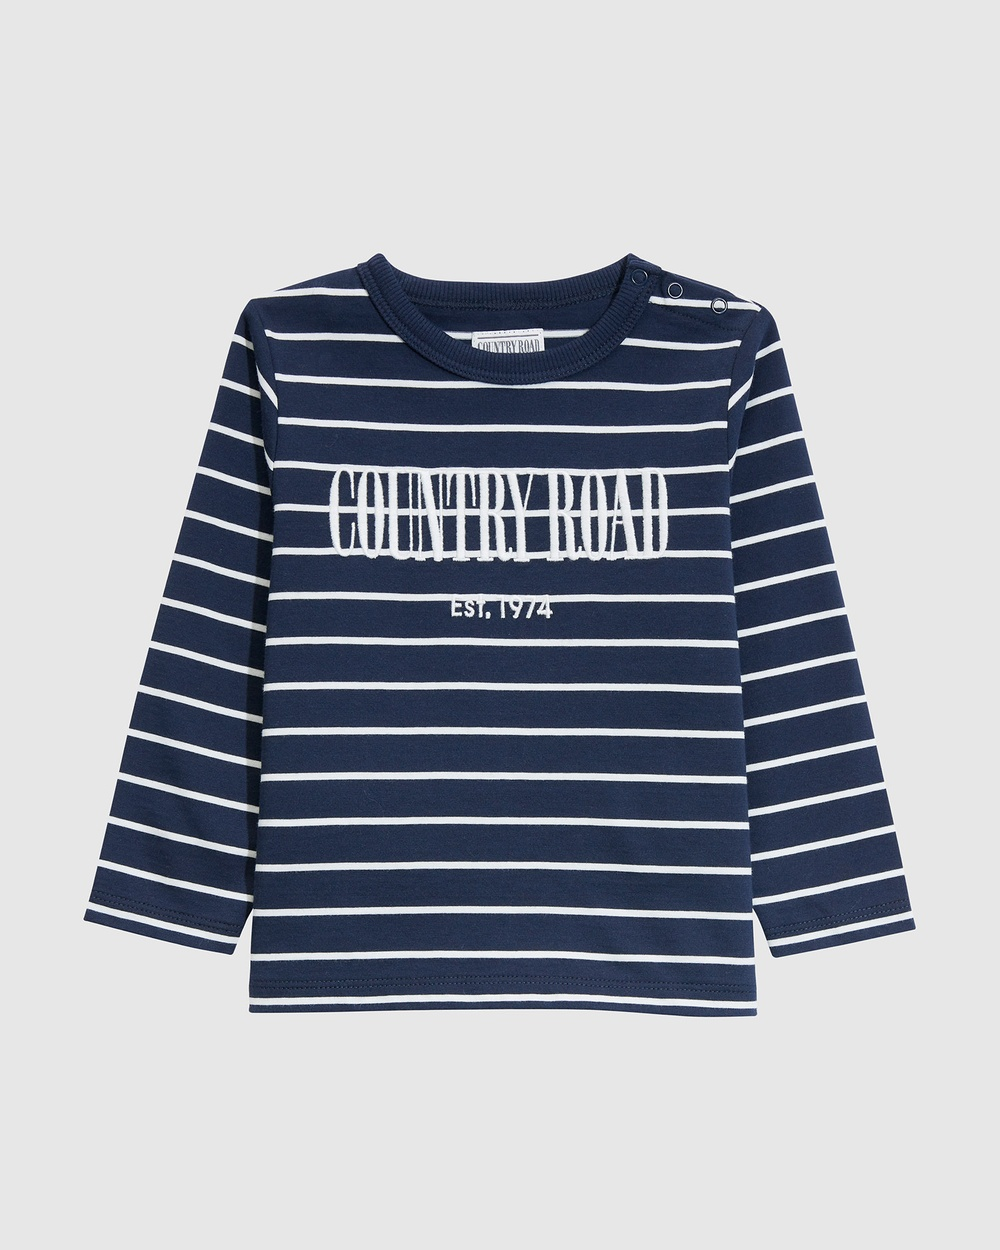 Country Road Verified Australian Cotton Long Sleeve Heritage T shirt T-Shirts & Singlets blue T-shirt